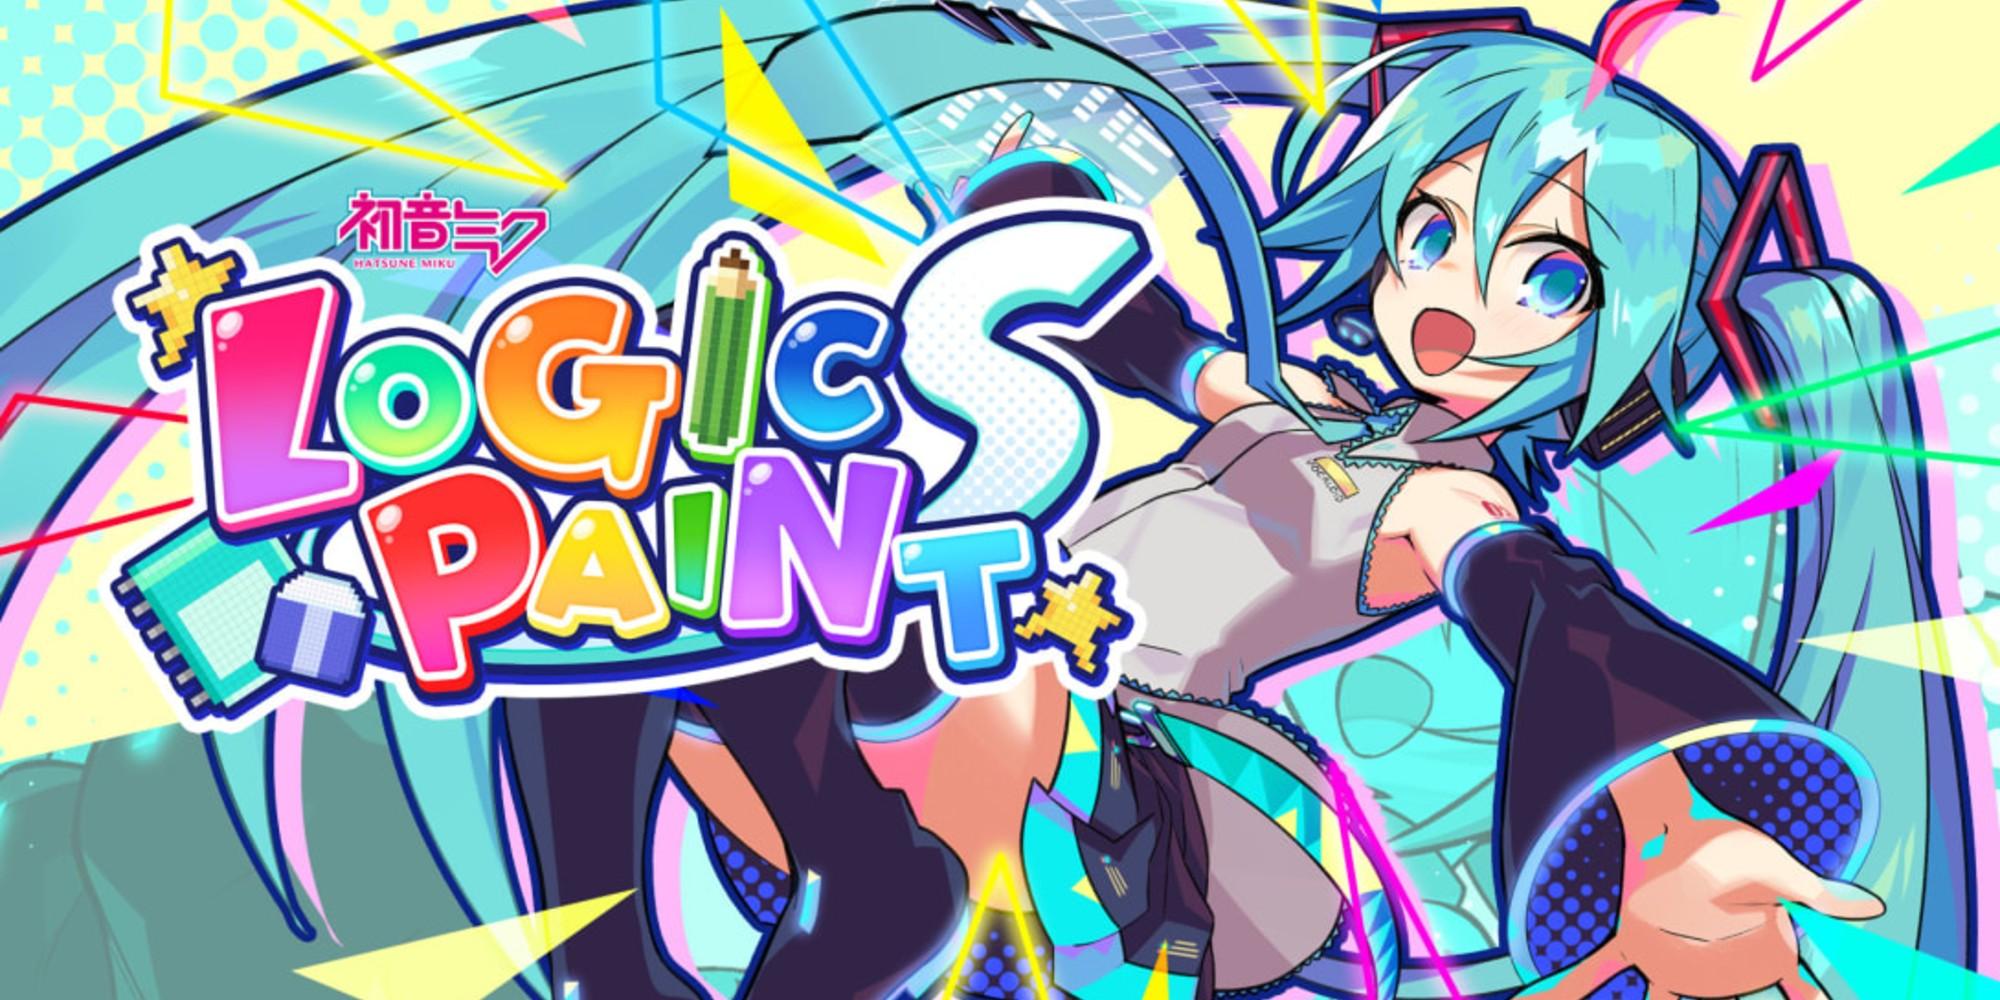 Hatsune Miku Logic Paint S Review